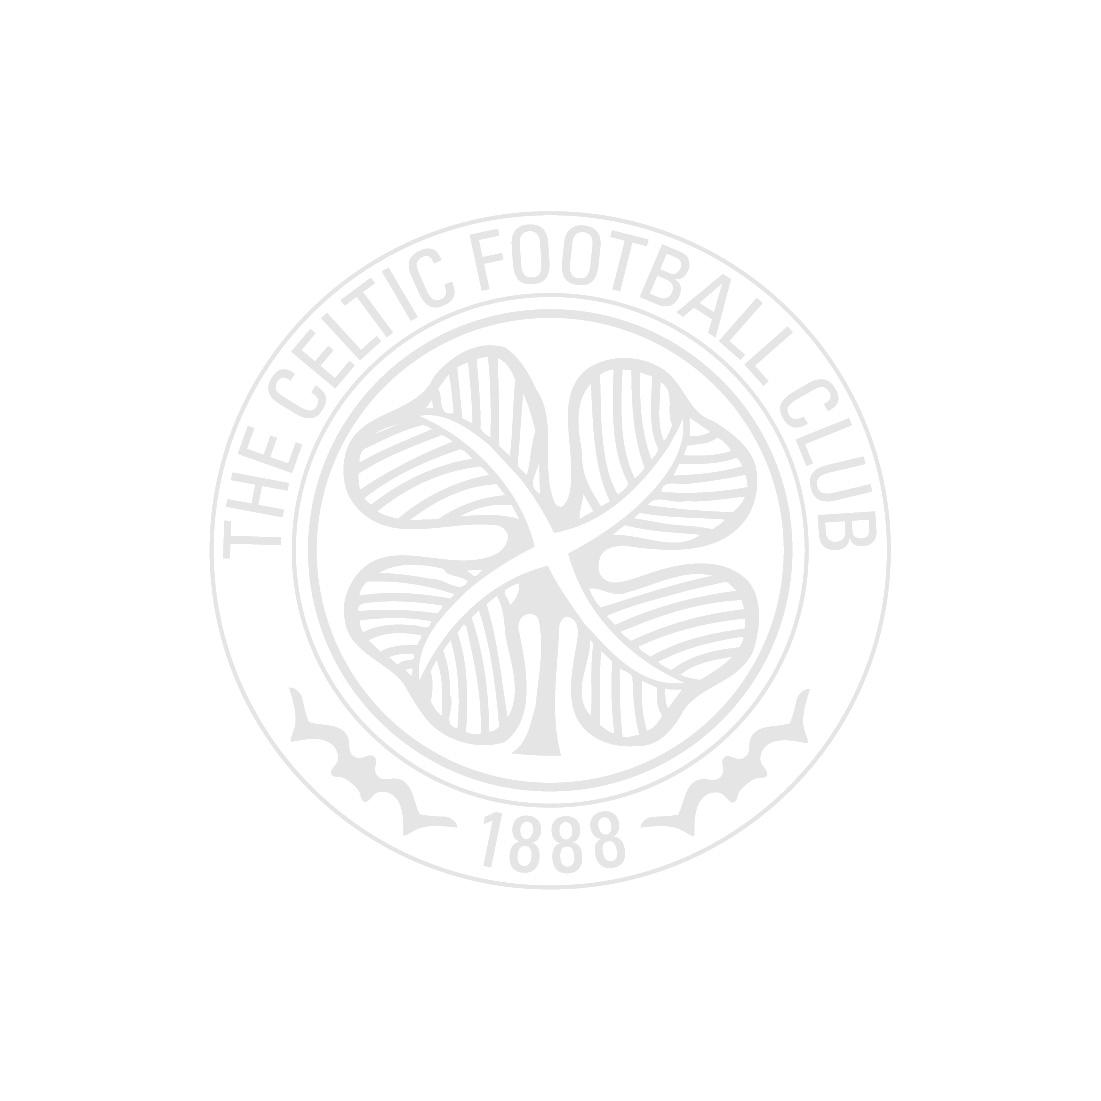 1996 Home Retro Celtic Jersey